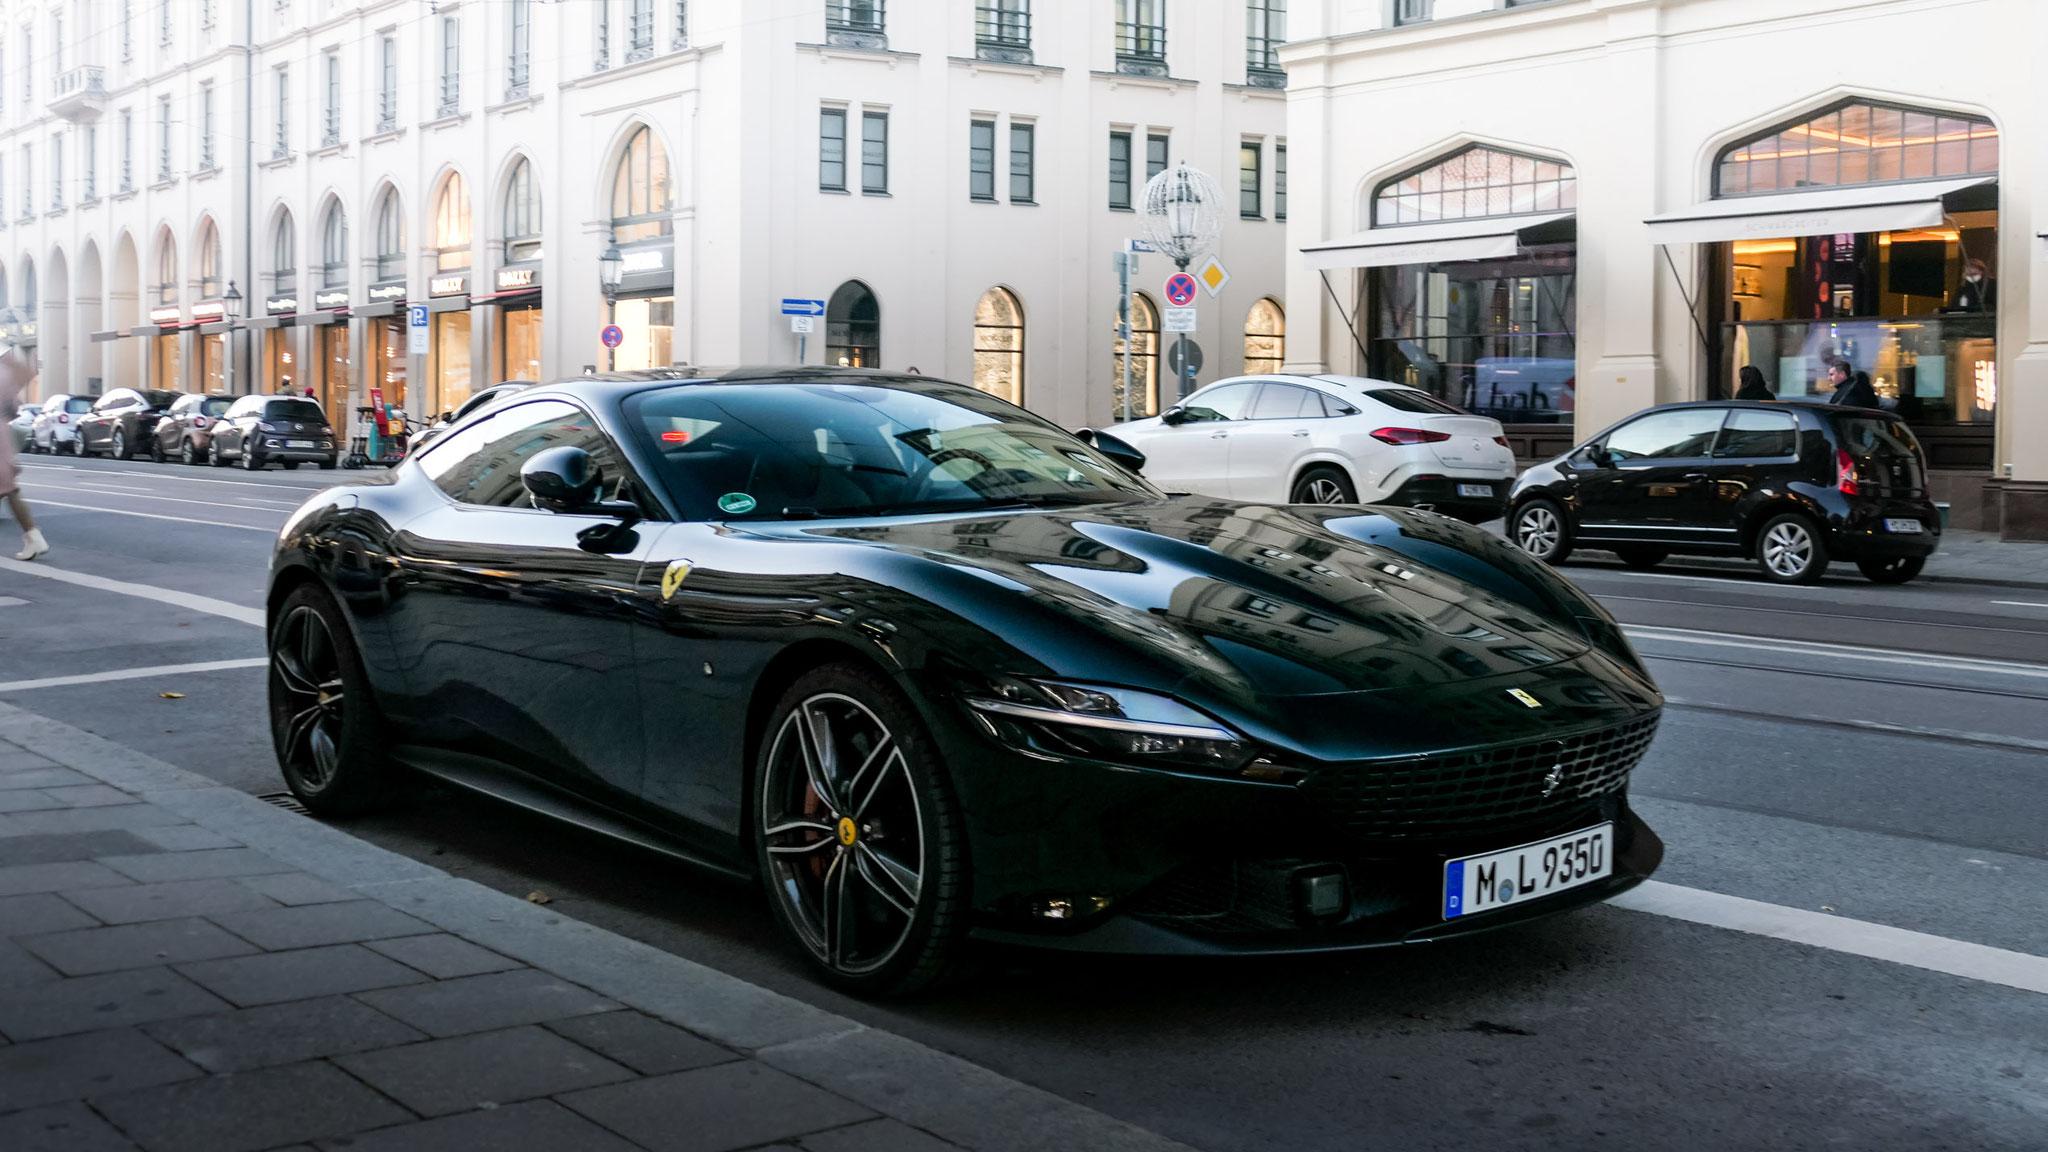 Ferrari Roma - M-L-9350